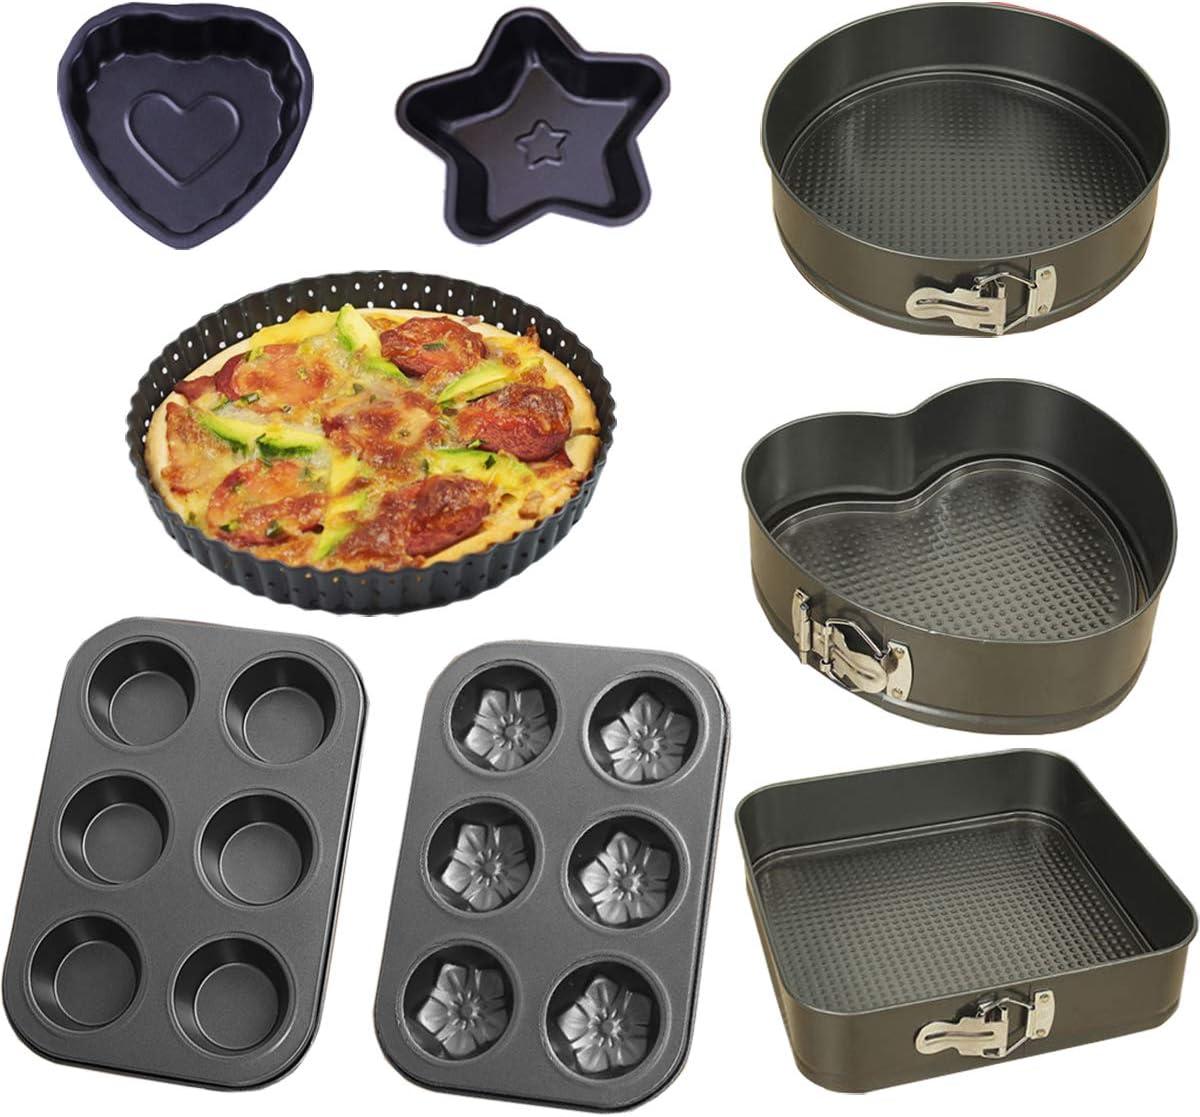 8 Pcs Baking Trays Set Oven Baking Set Cake Tins for Baking Set with Muffin Tray Non-Stick Kitchen Trays Set with Round /& Square Cake Tin Cake Pizza Pans Set-A